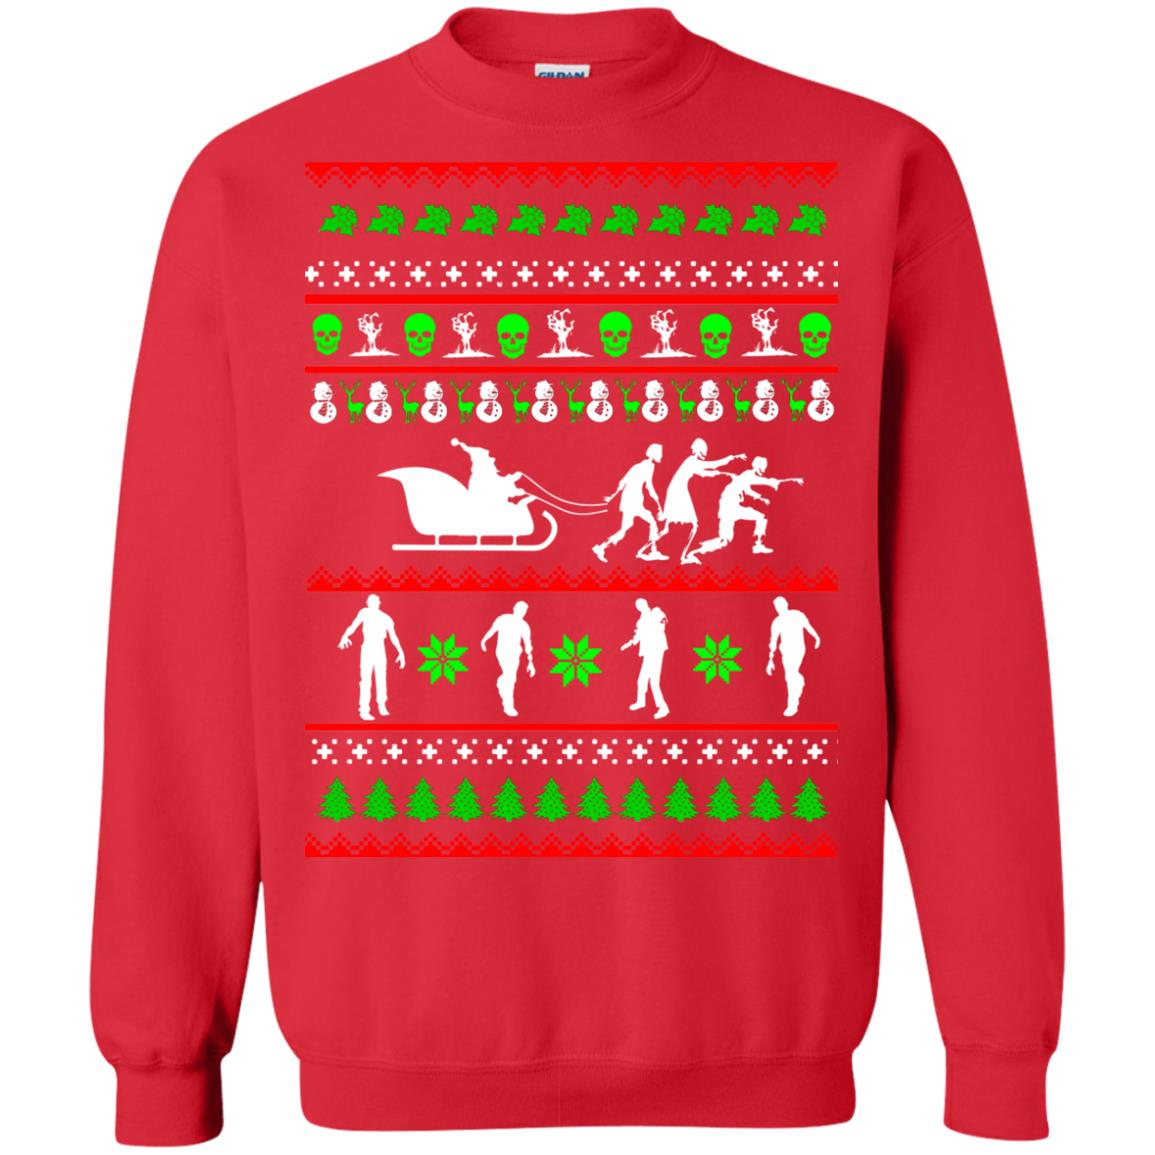 image 5837 - Zombie Christmas Sweater, Hoodie